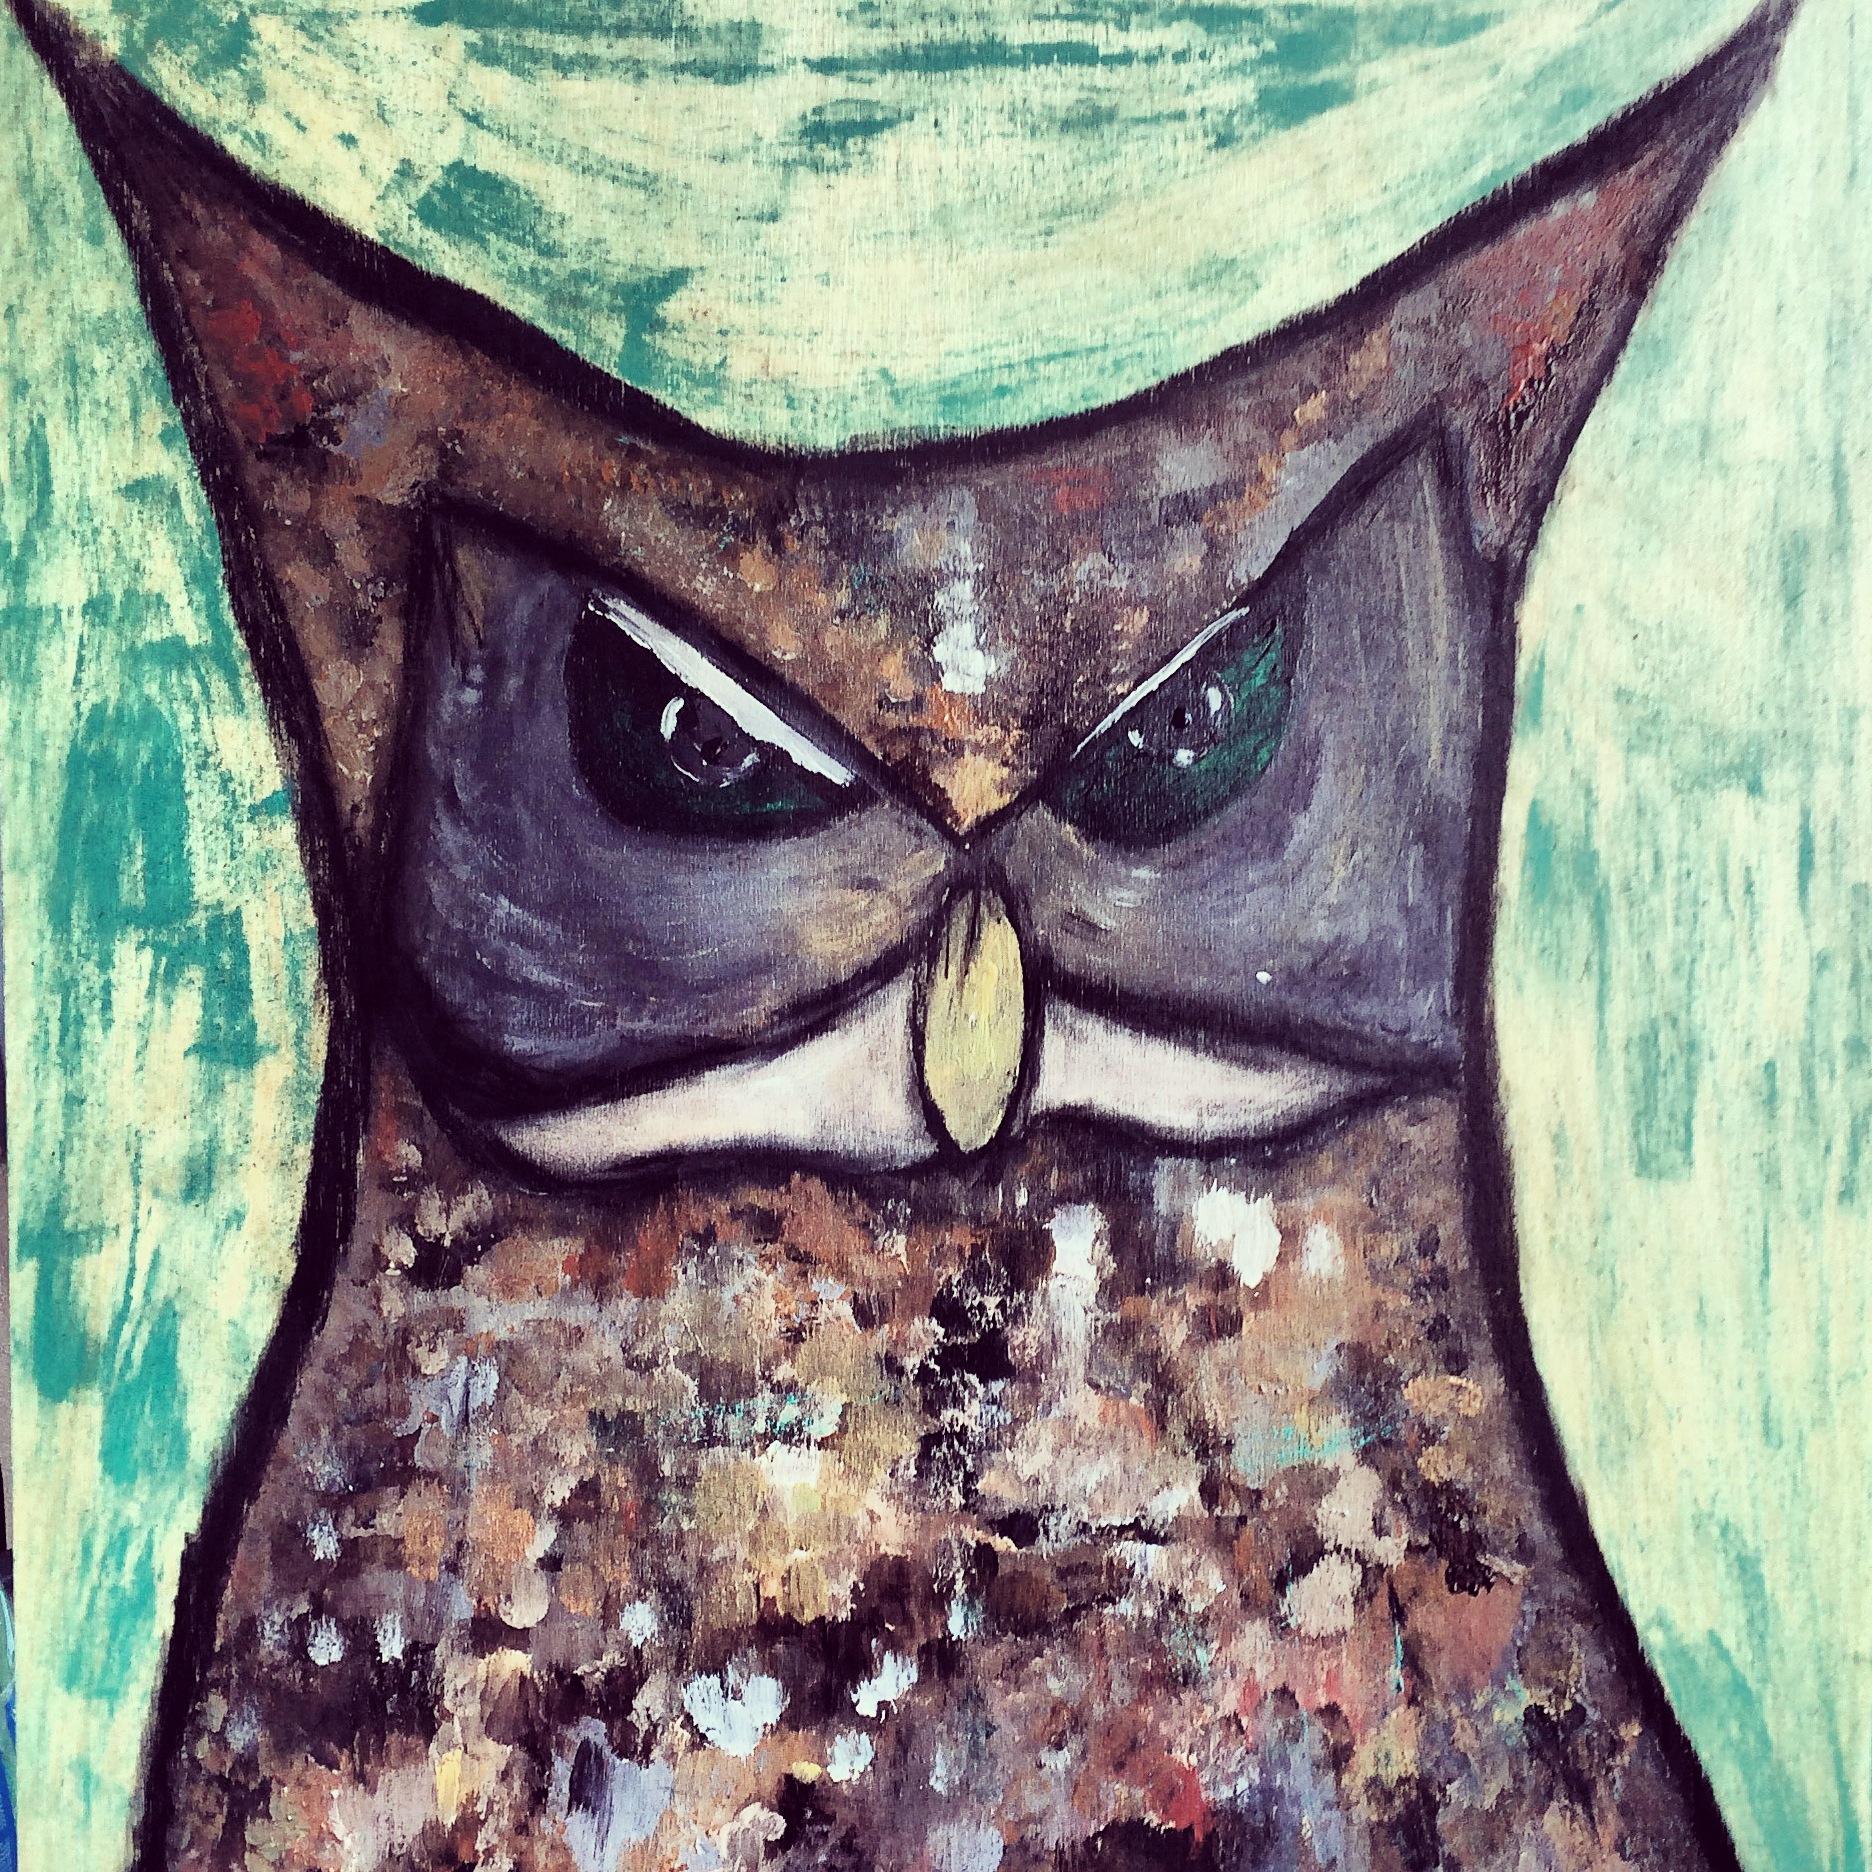 #2: NIGHT OWL